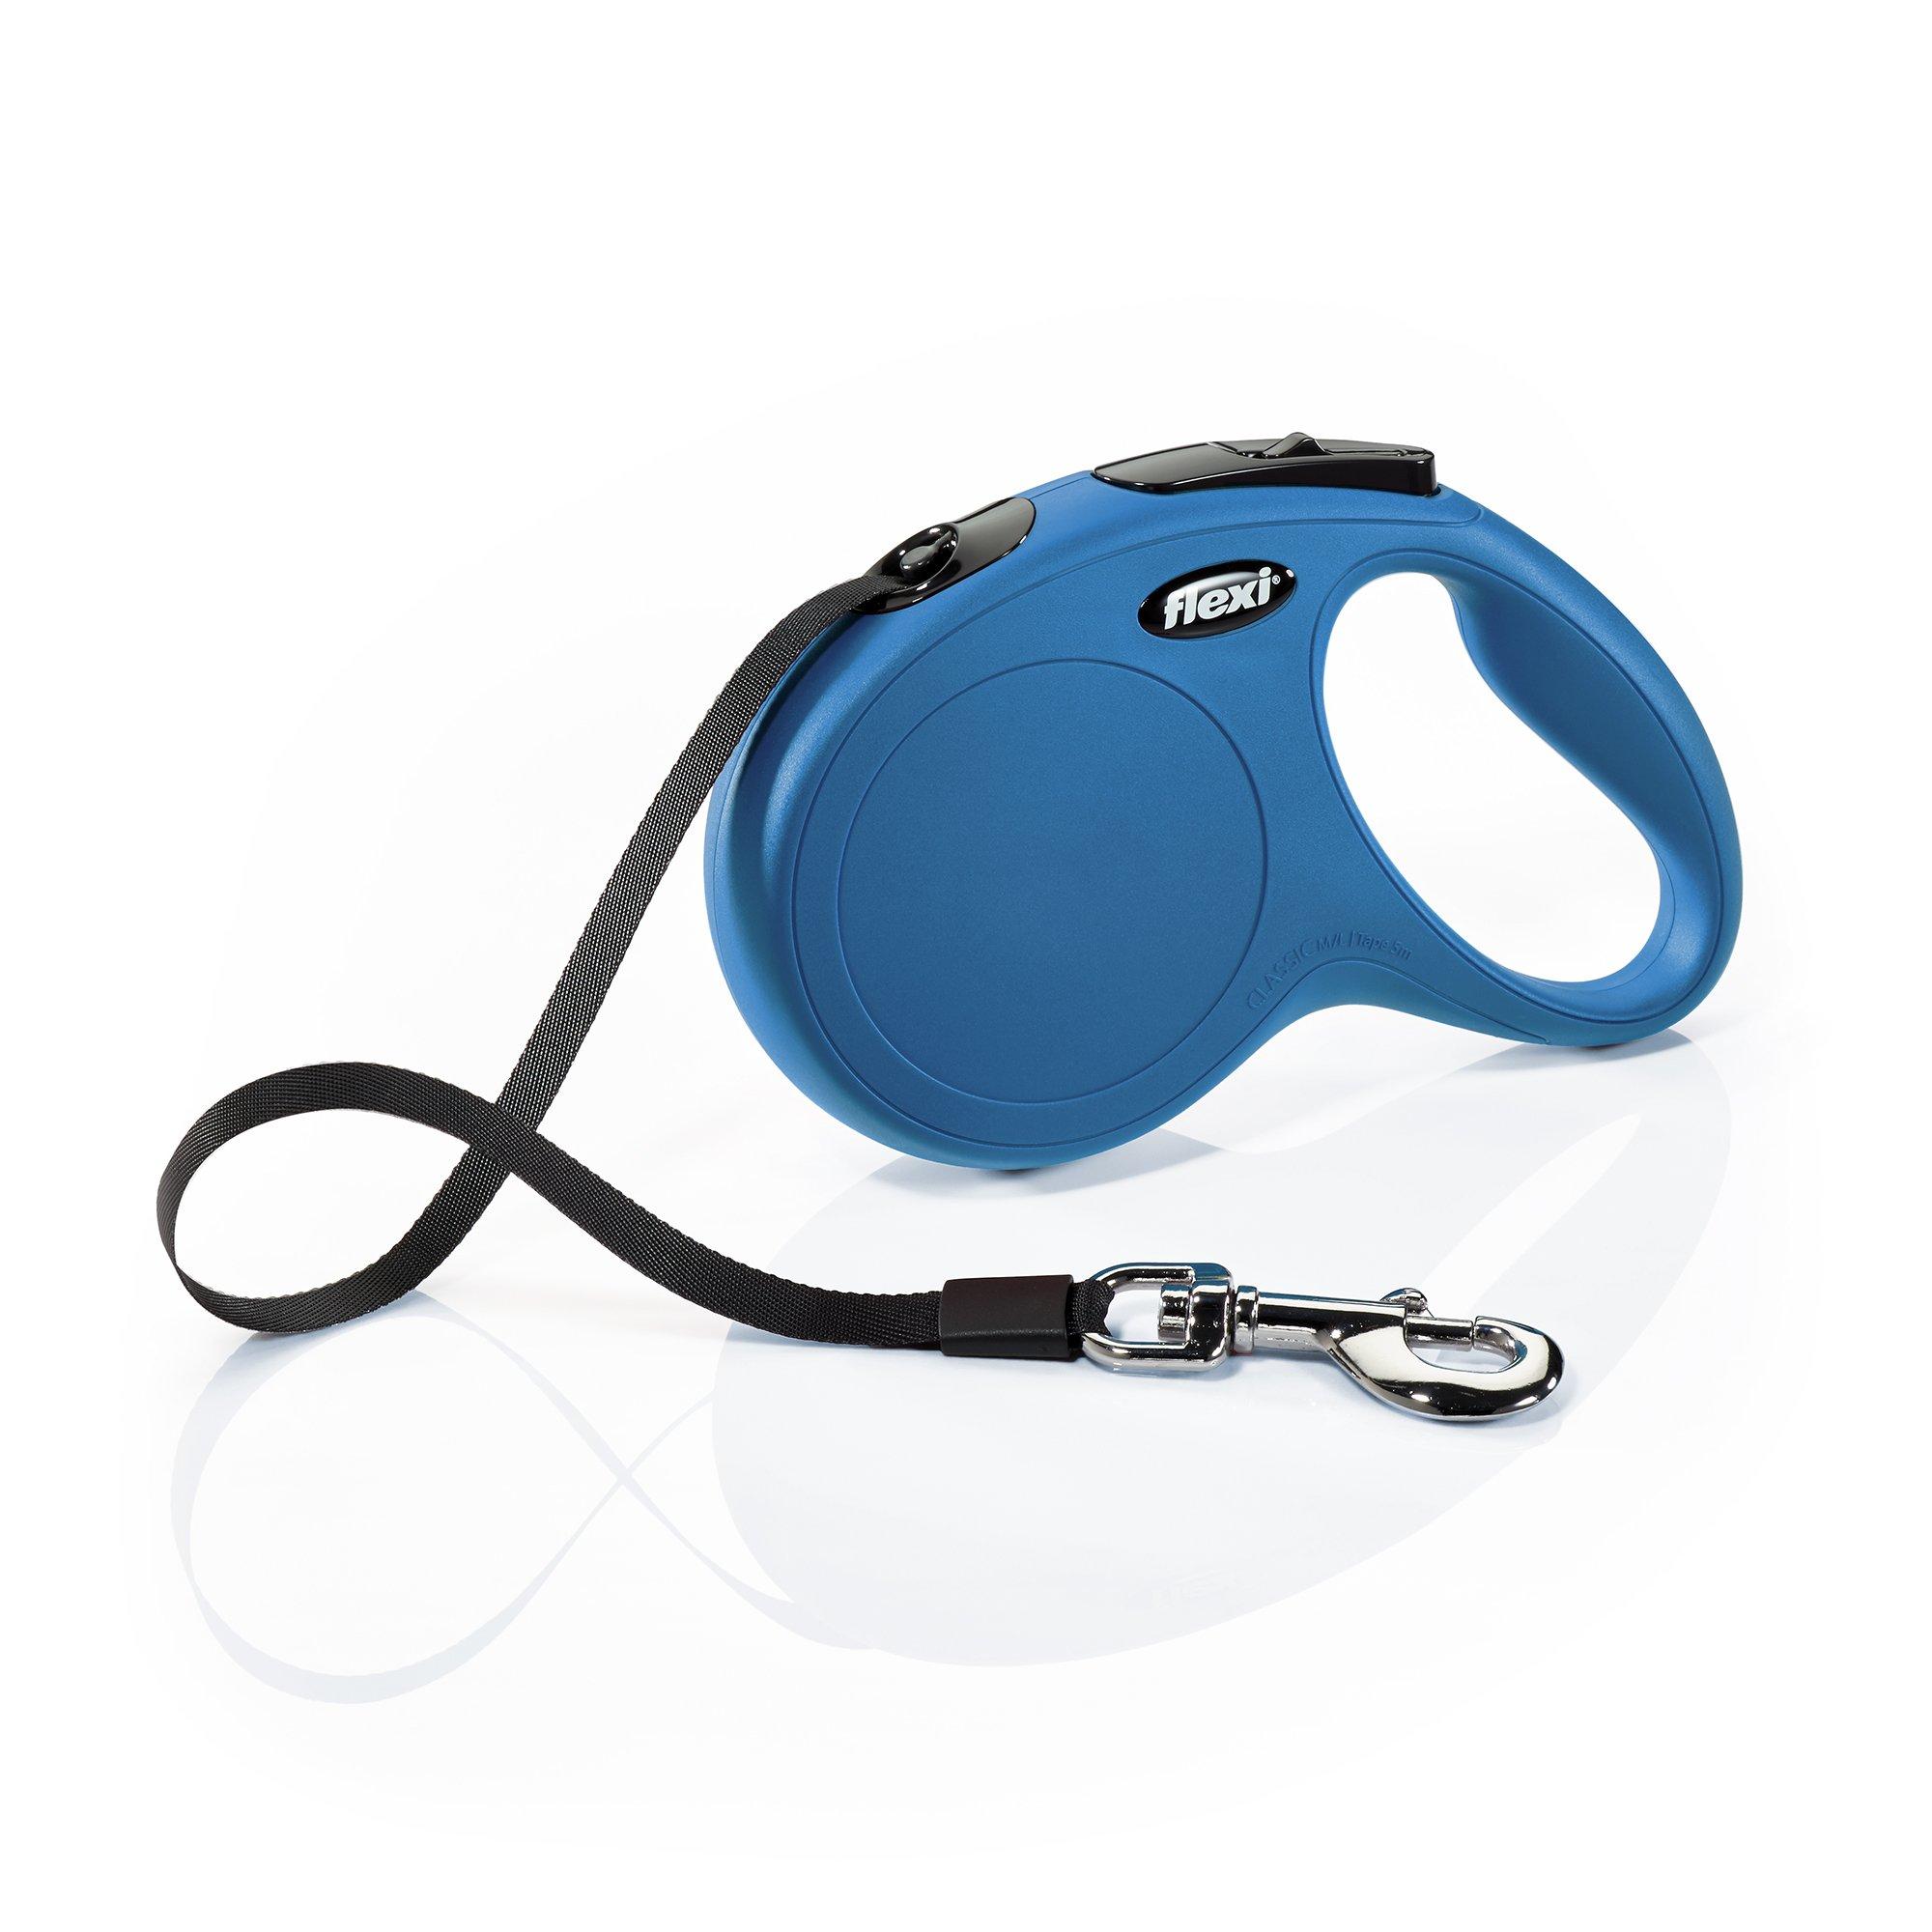 Flexi New Classic Retractable Dog Leash (Tape), 16 ft, Medium/Large, Blue